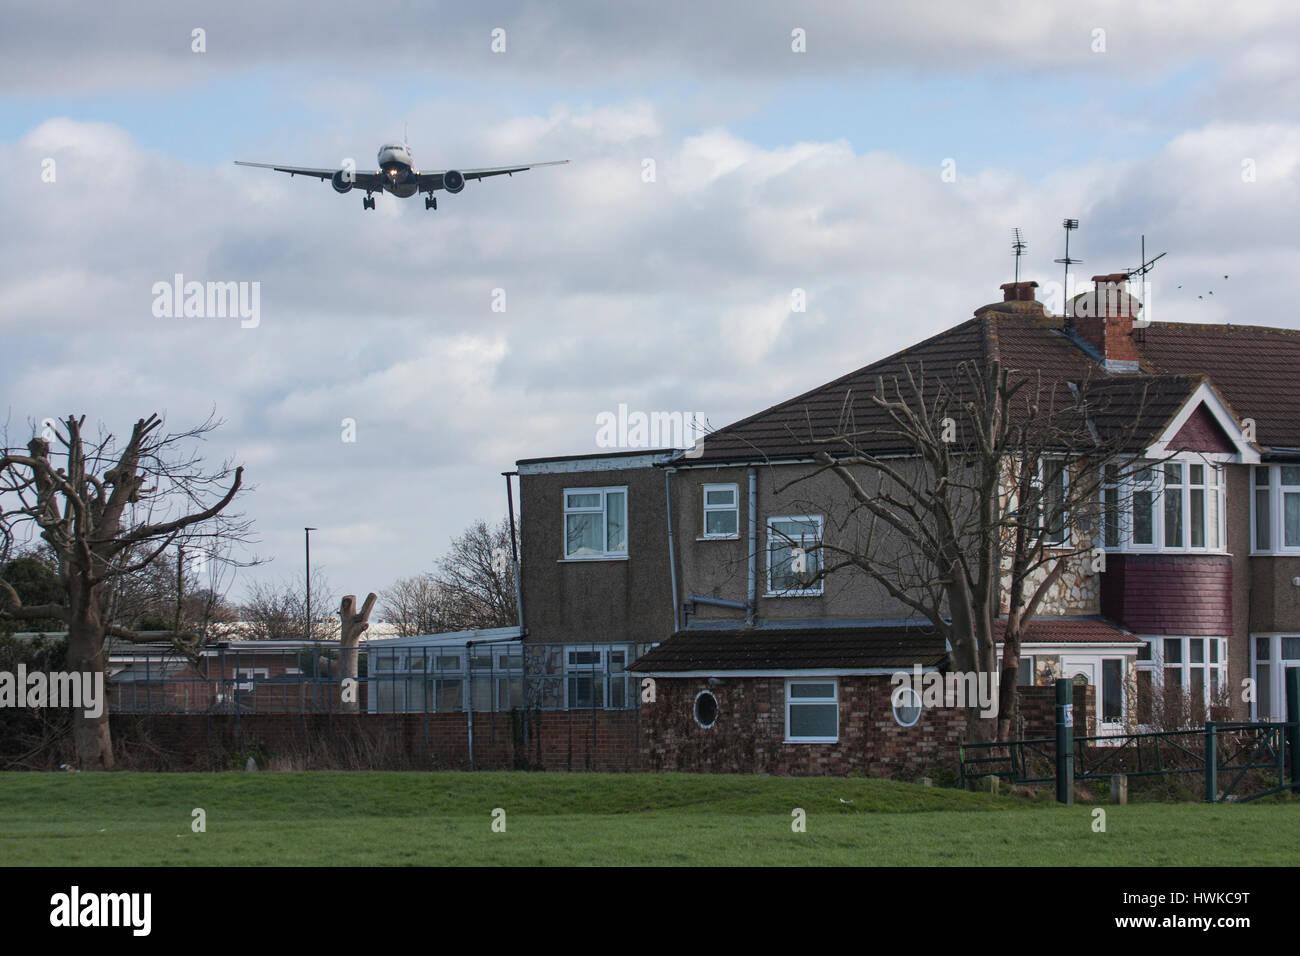 British Airways plane approaching London Heathrow Airport, UK - Stock Image